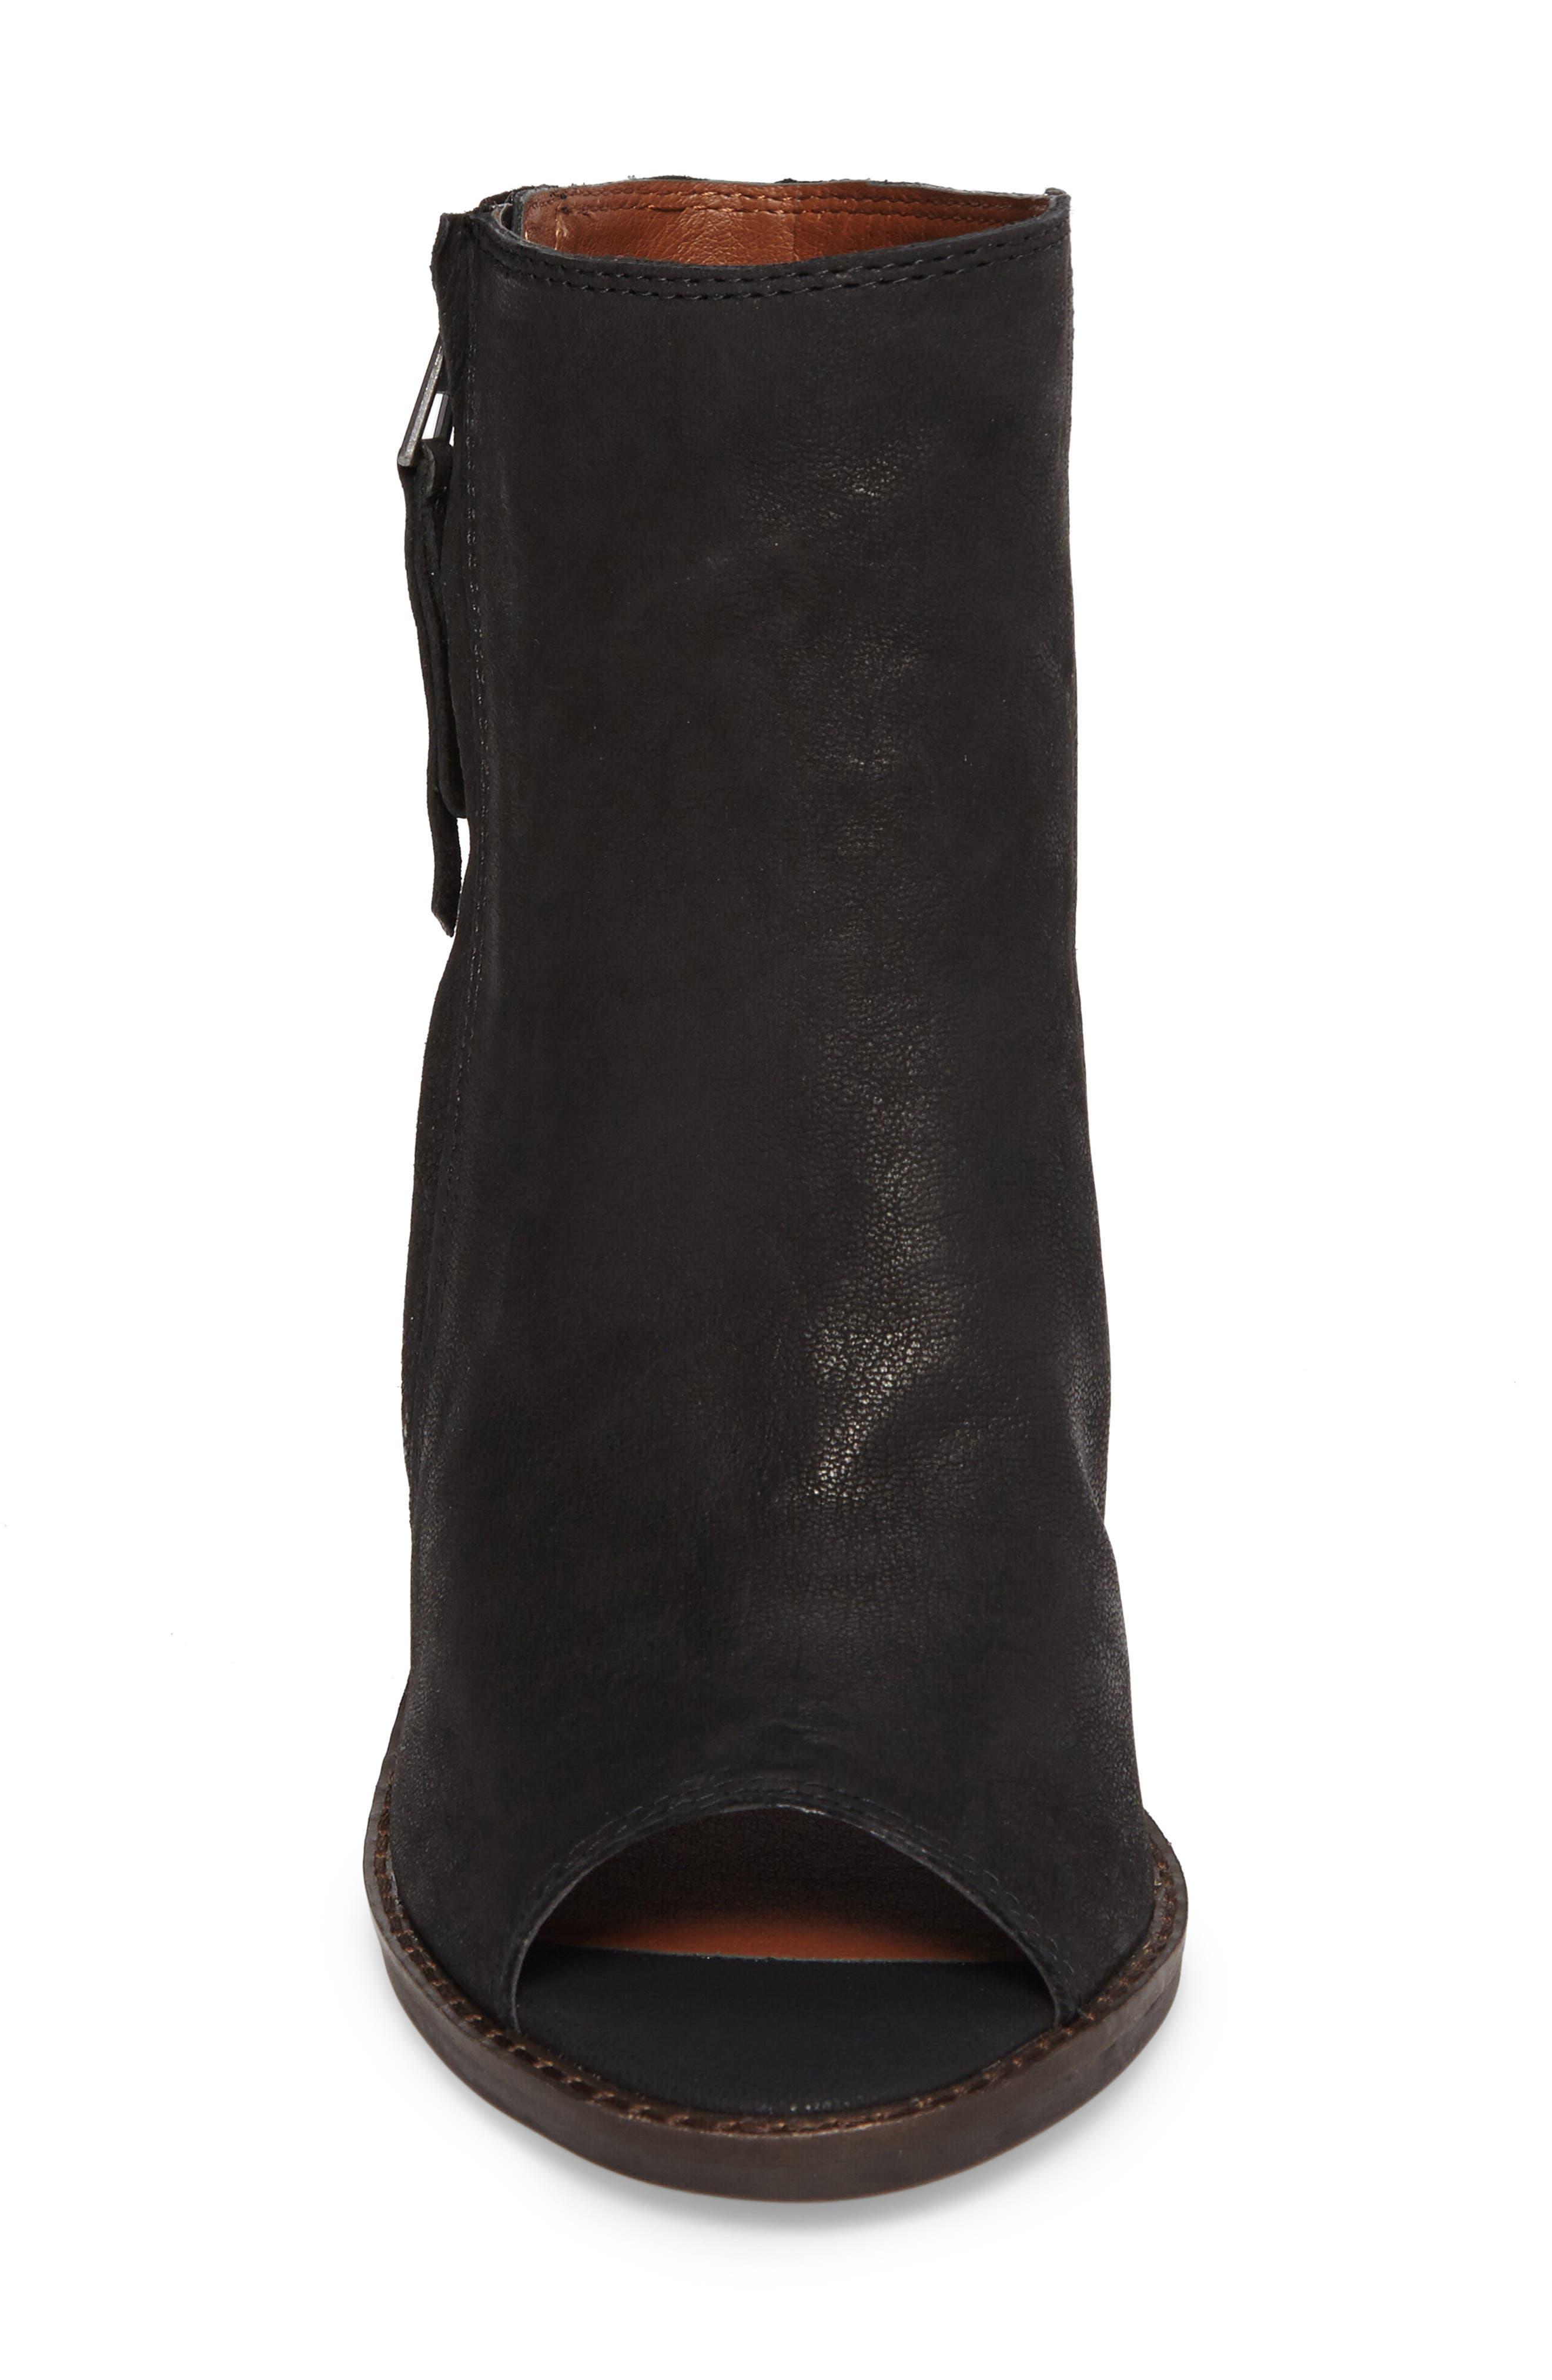 Terrie Peep Toe Bootie,                             Alternate thumbnail 5, color,                             Black Leather